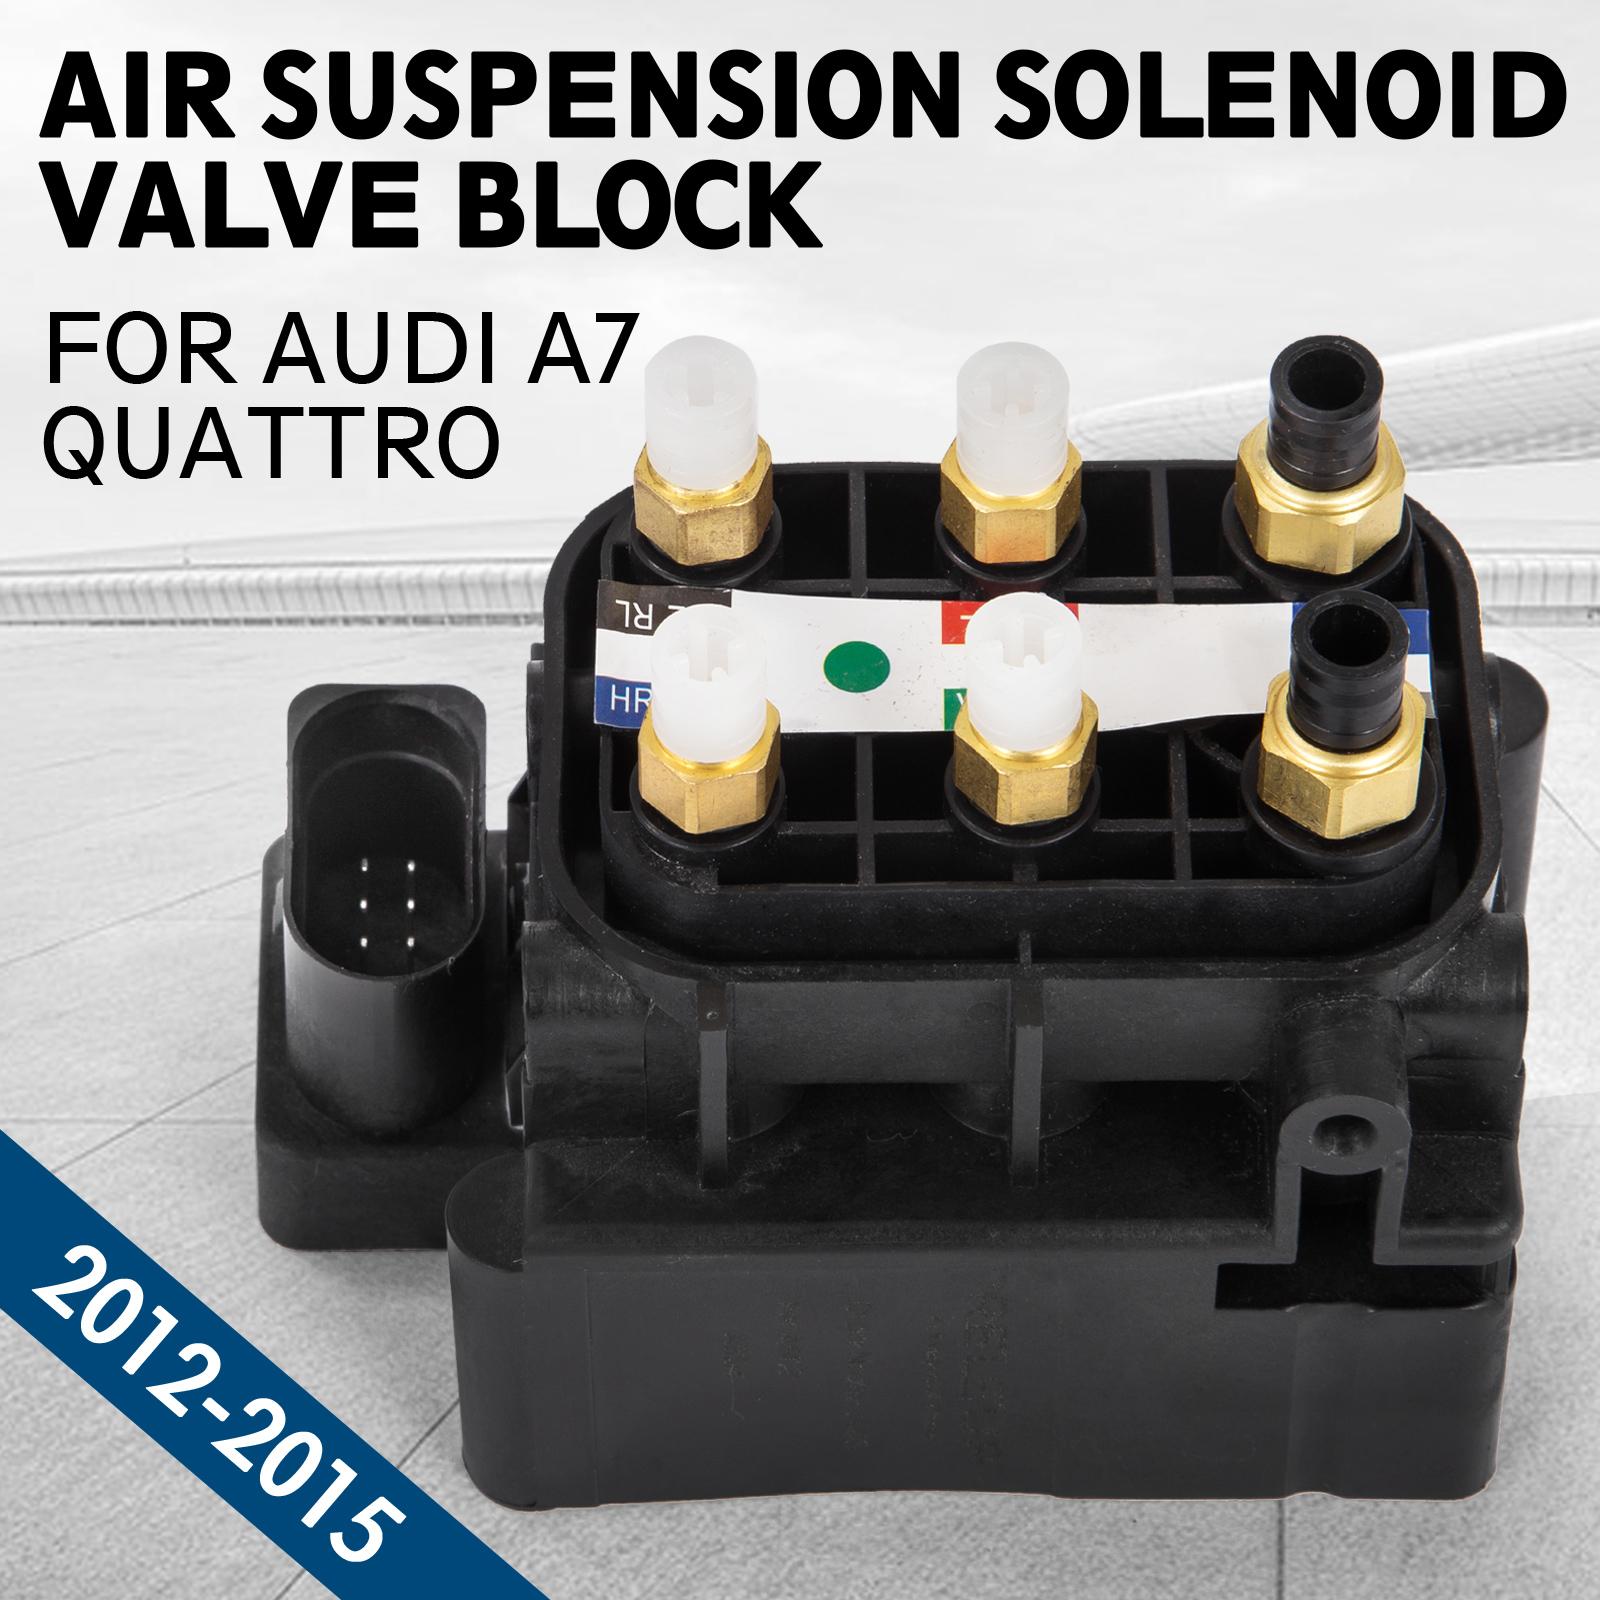 de Air Suspension Valve Control Unit For Audi A7 Quattro 12-15 4H0616013A al